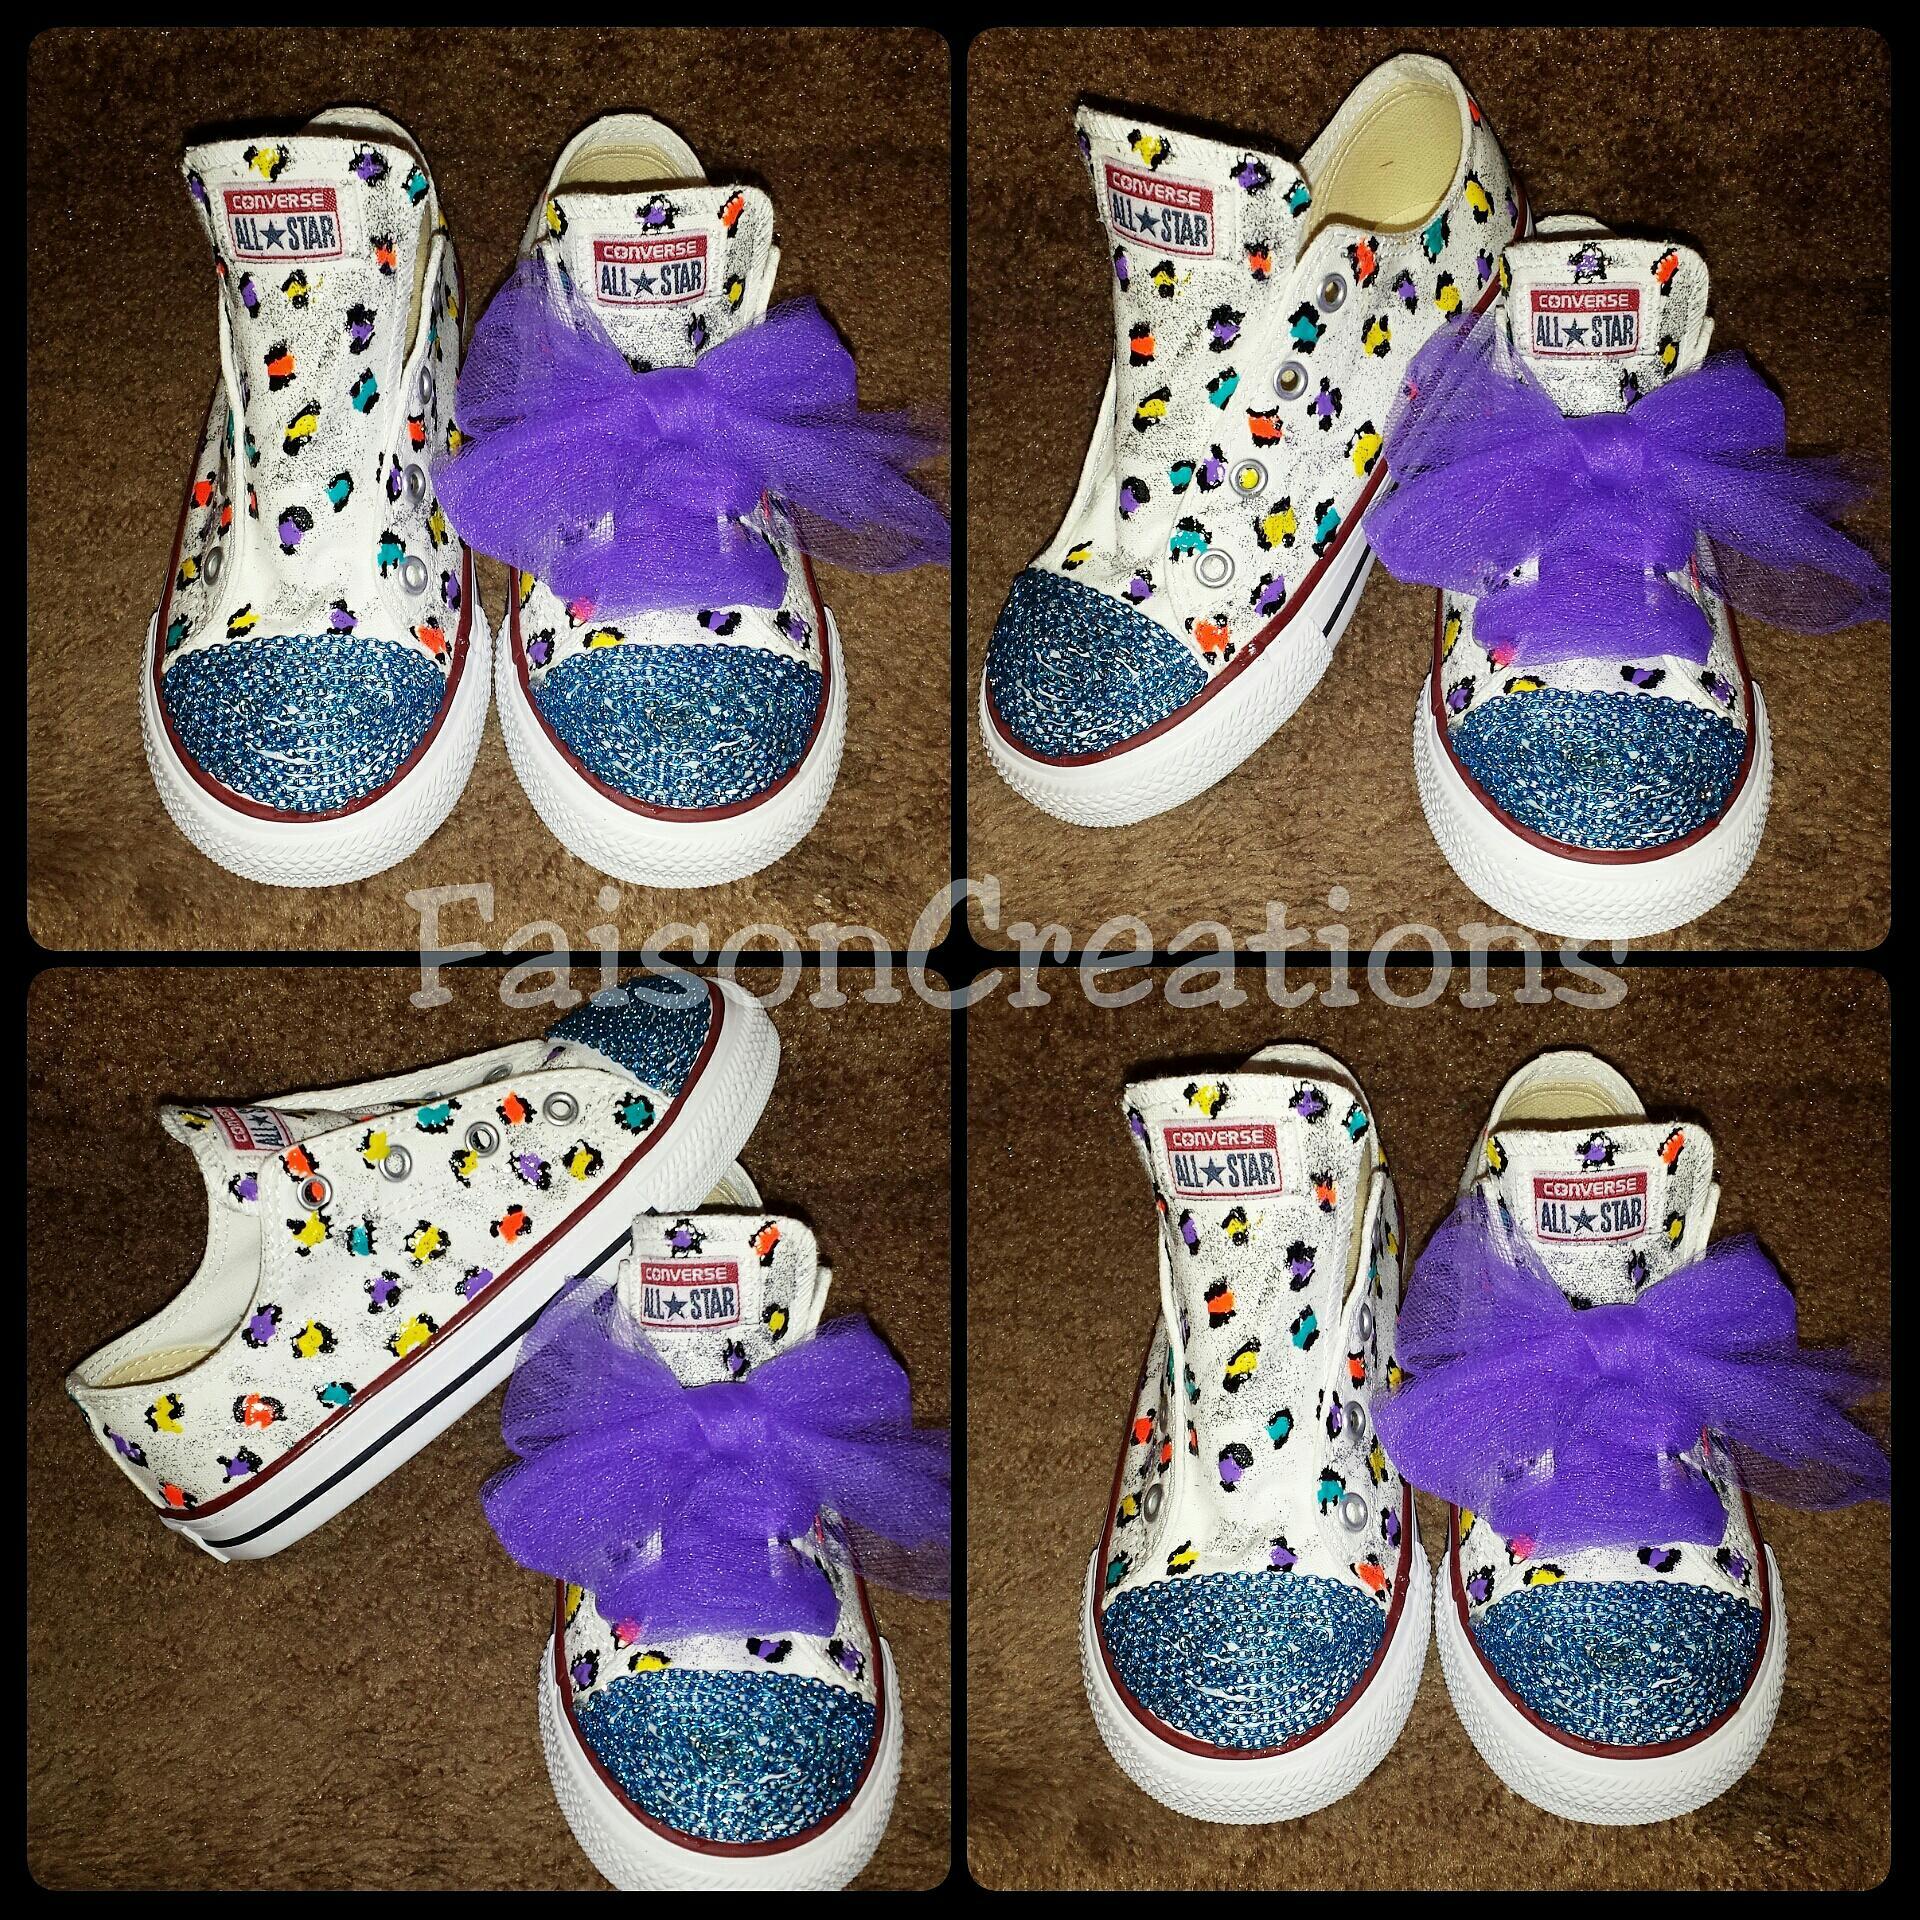 ba3adb11d5dfe Kids Custom Leopard Print Converse · FaisonCreations · Online Store ...